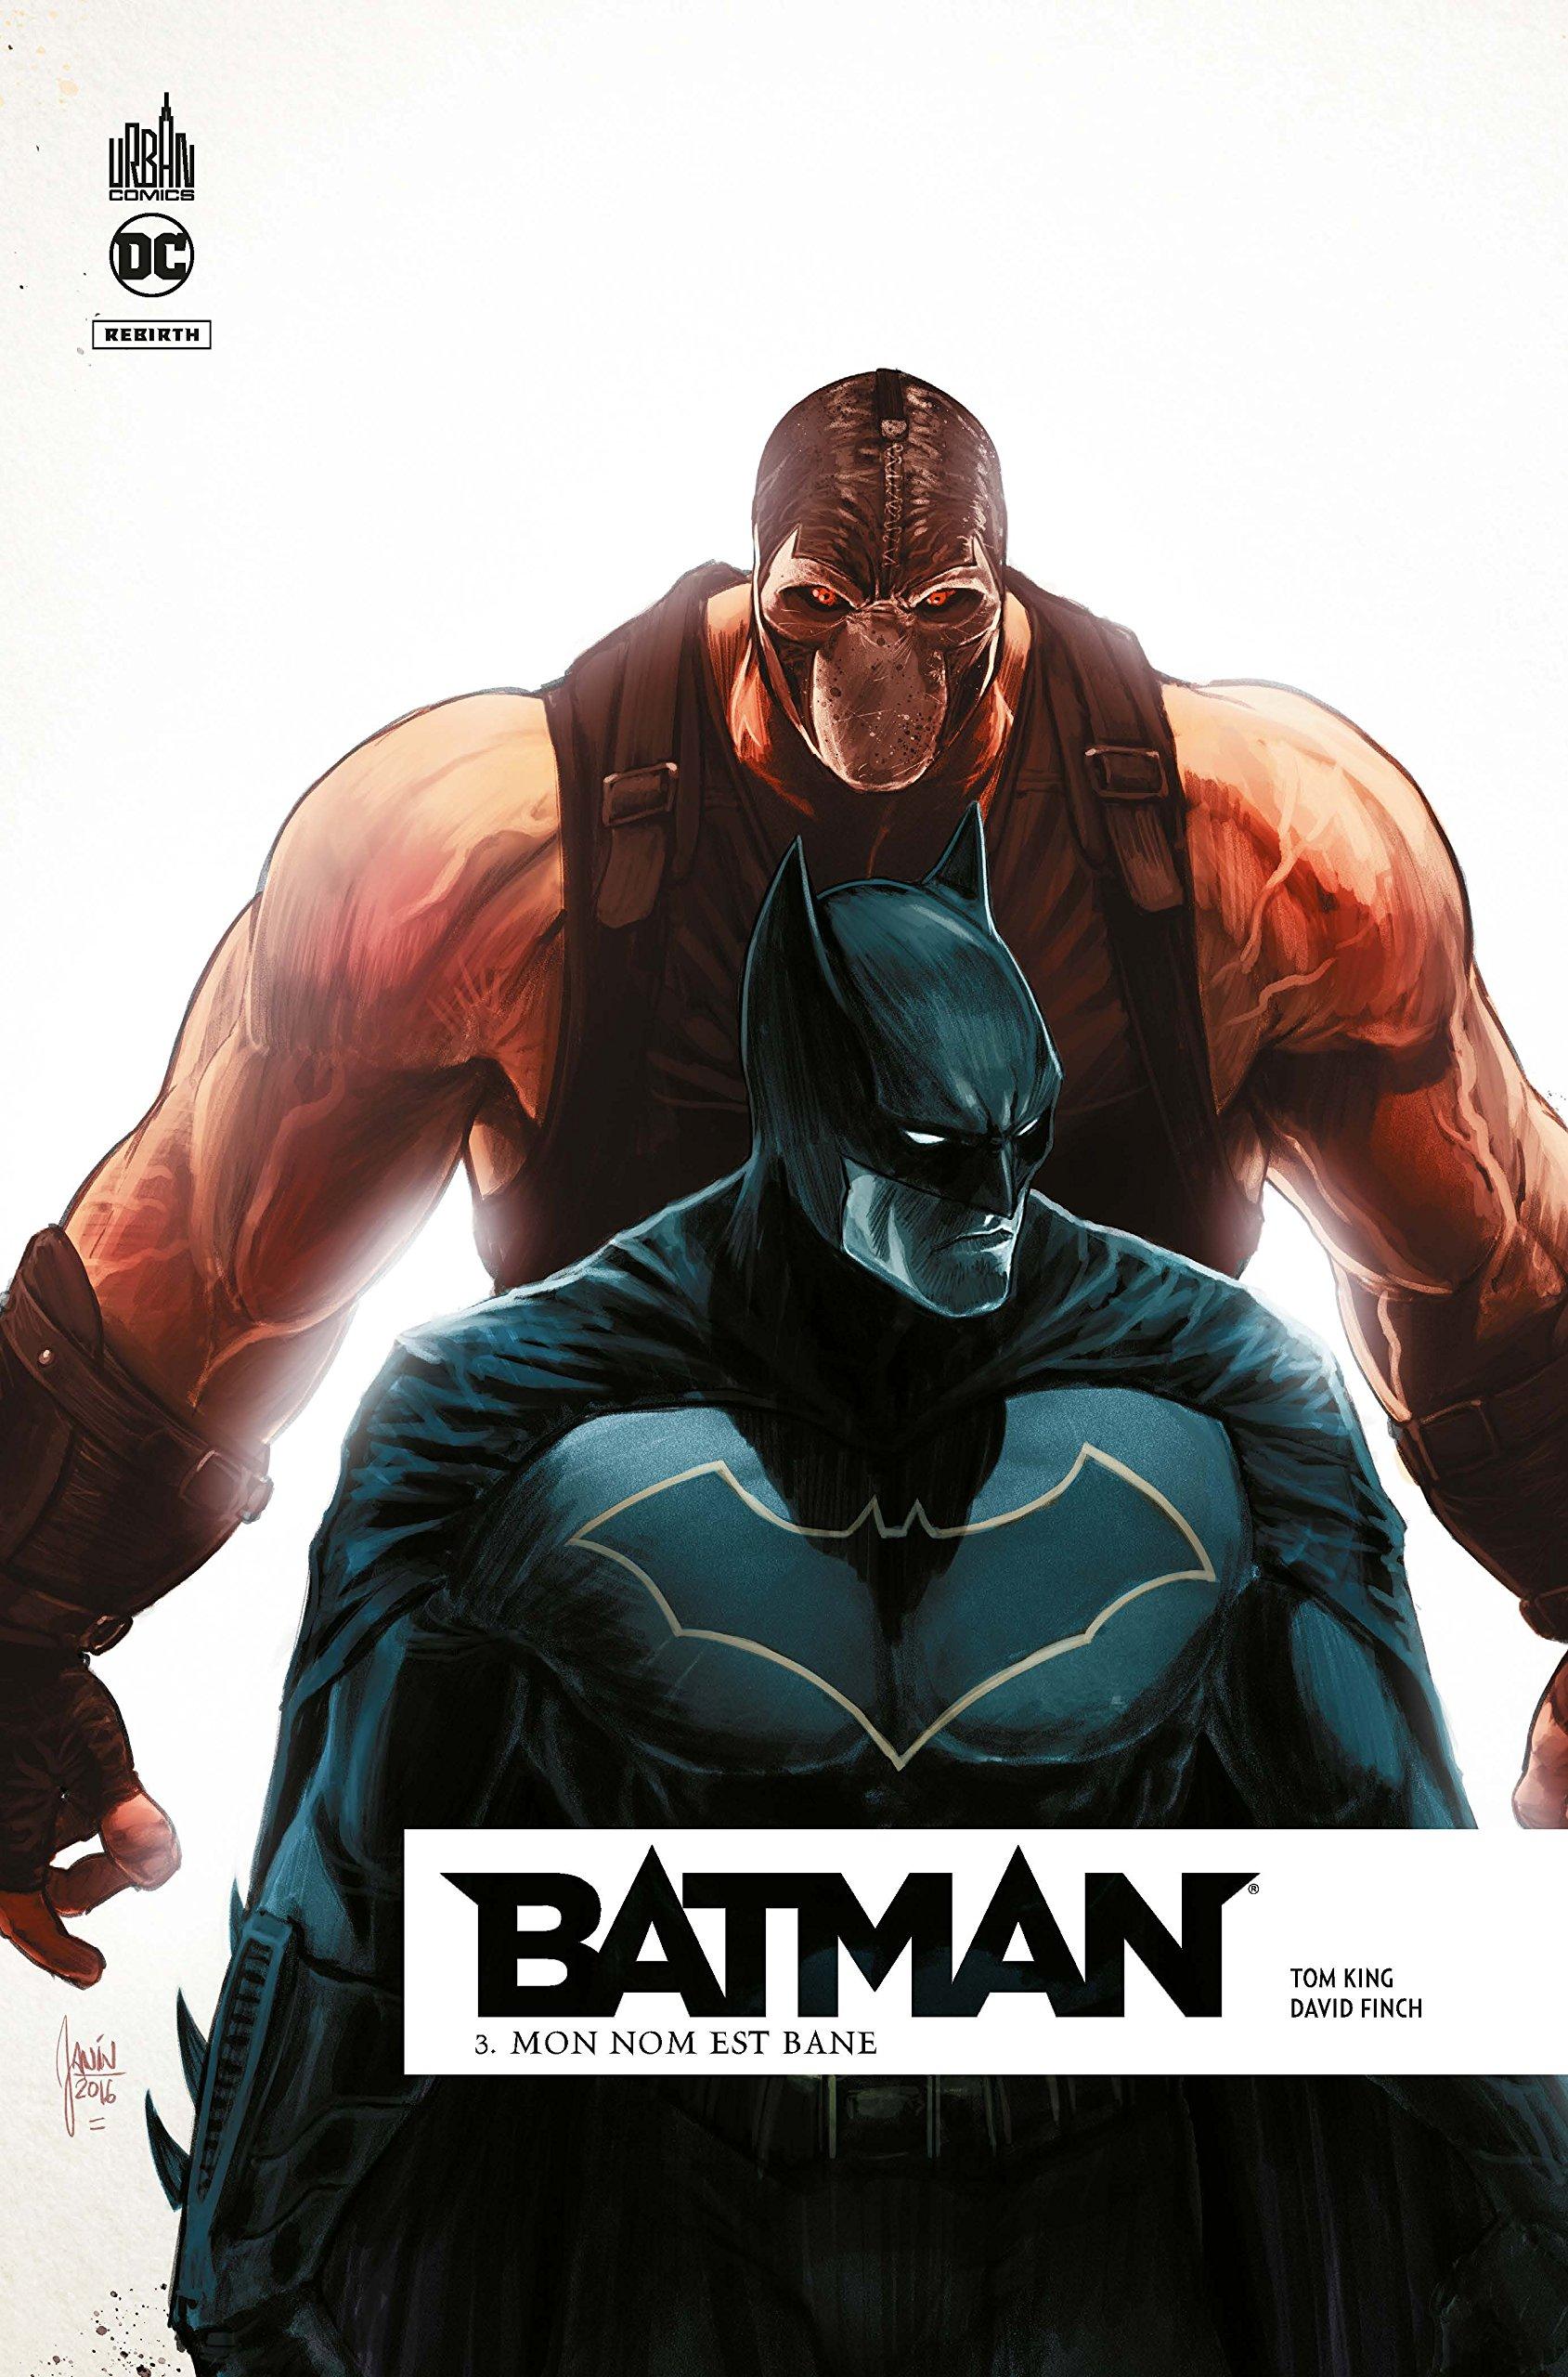 Batman Rebirth 3 - Mon nom est Bane